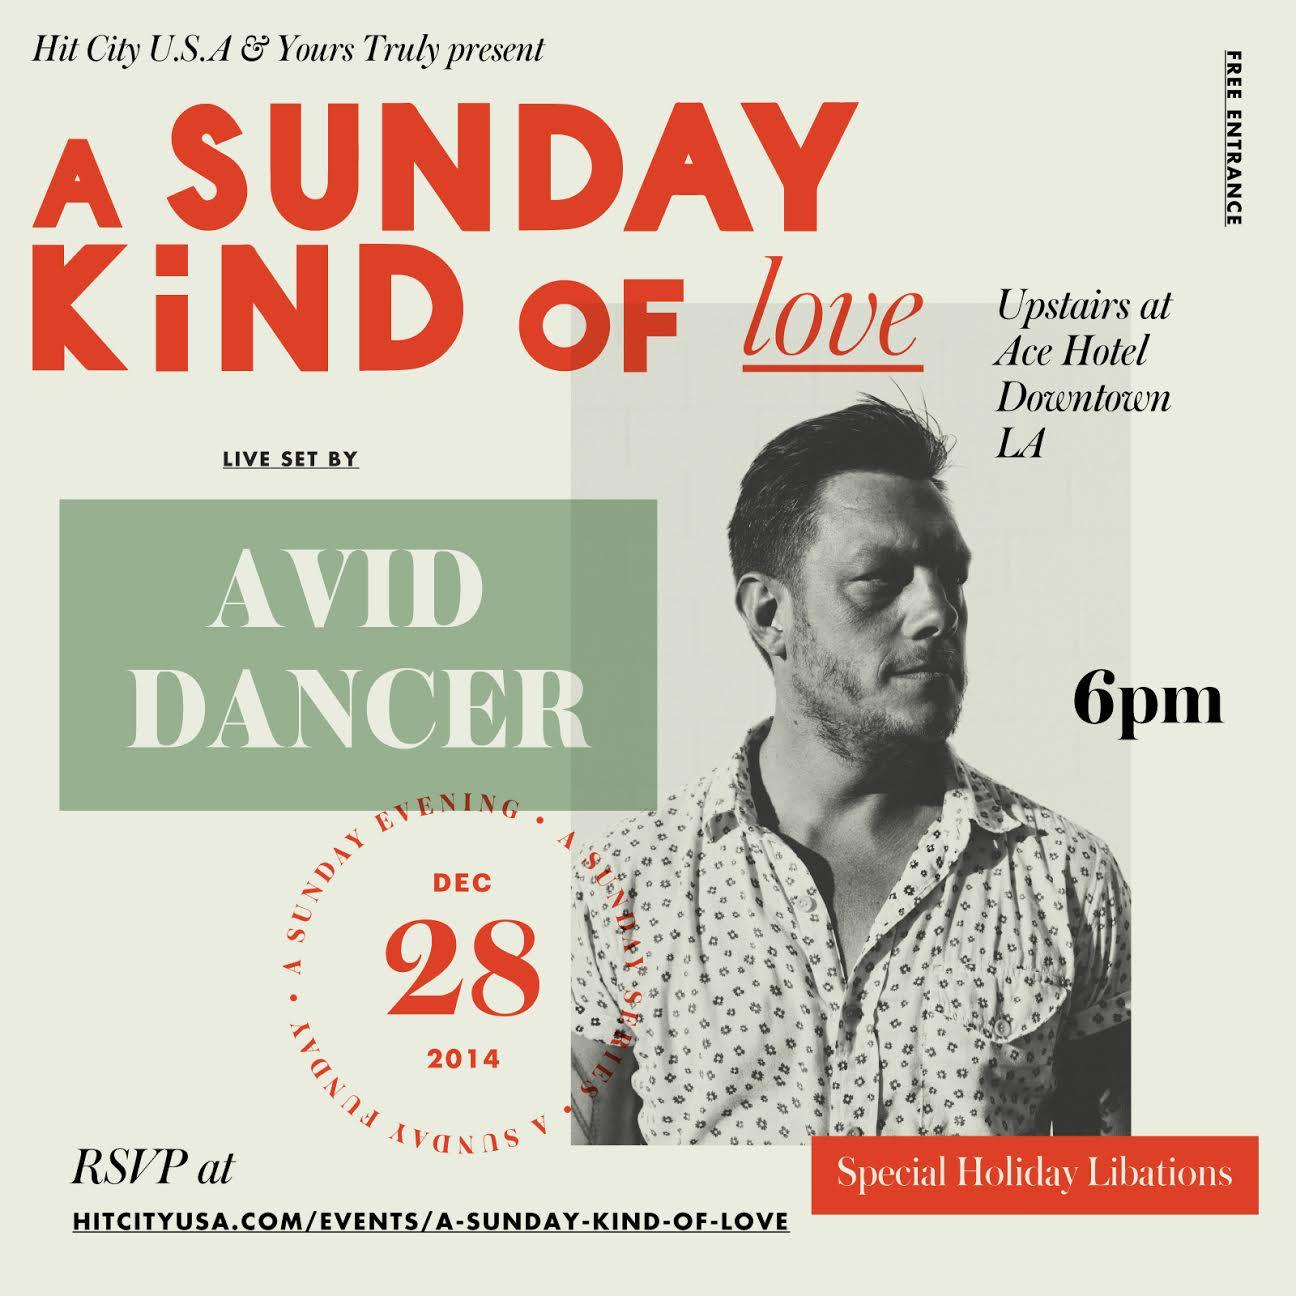 A Sunday Kind of Love w/ Avid Dancer